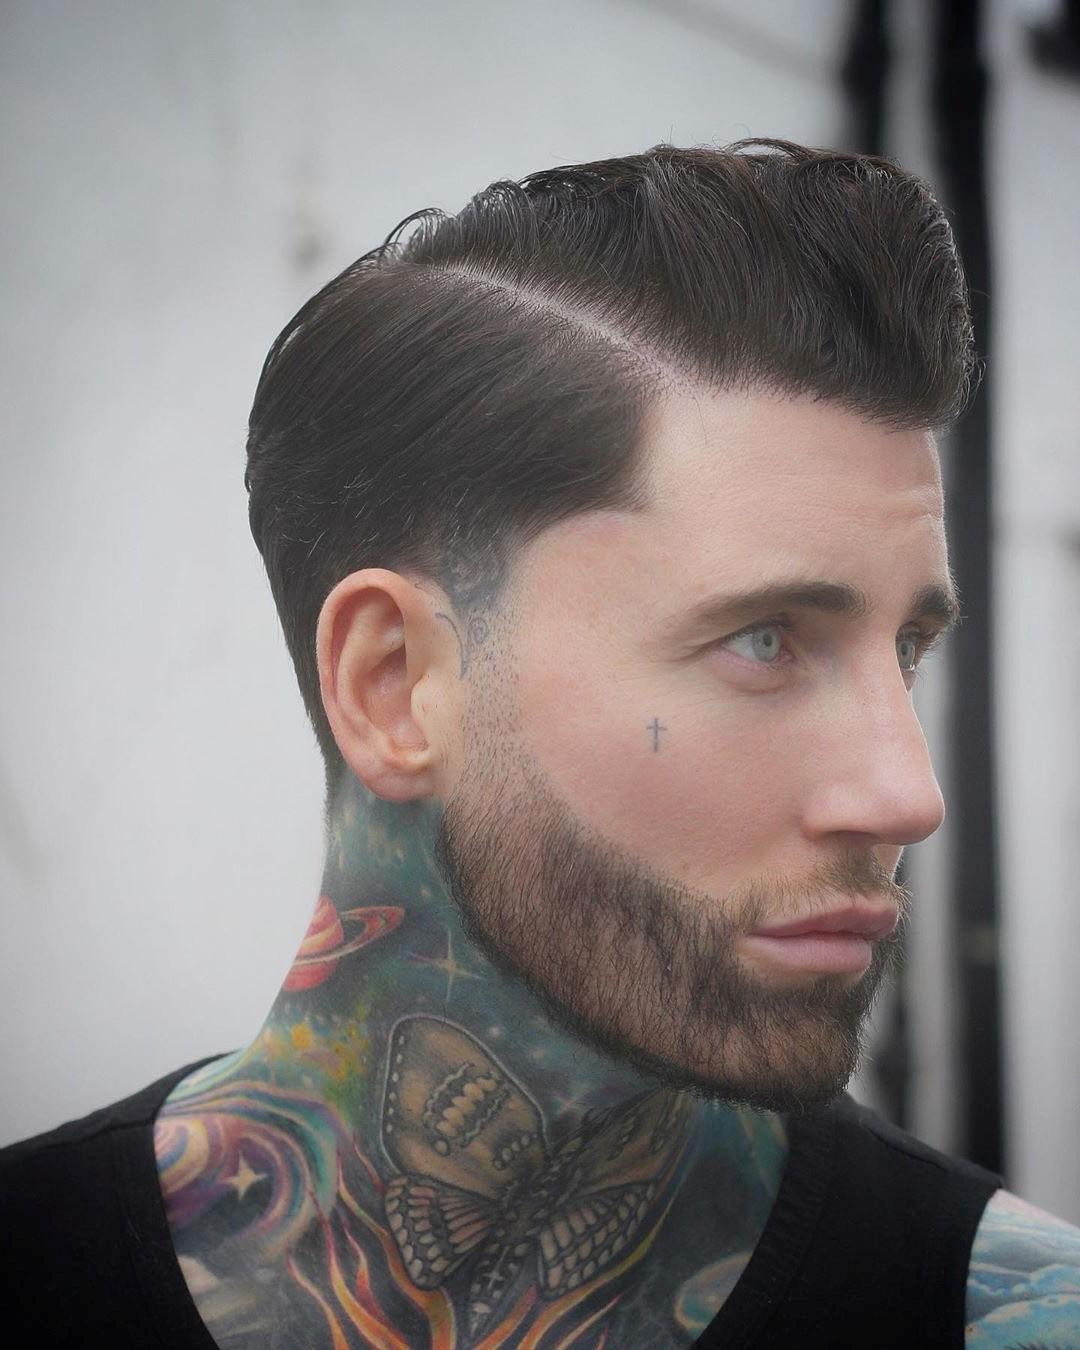 Hard Part Pompadour Undercut with Beard